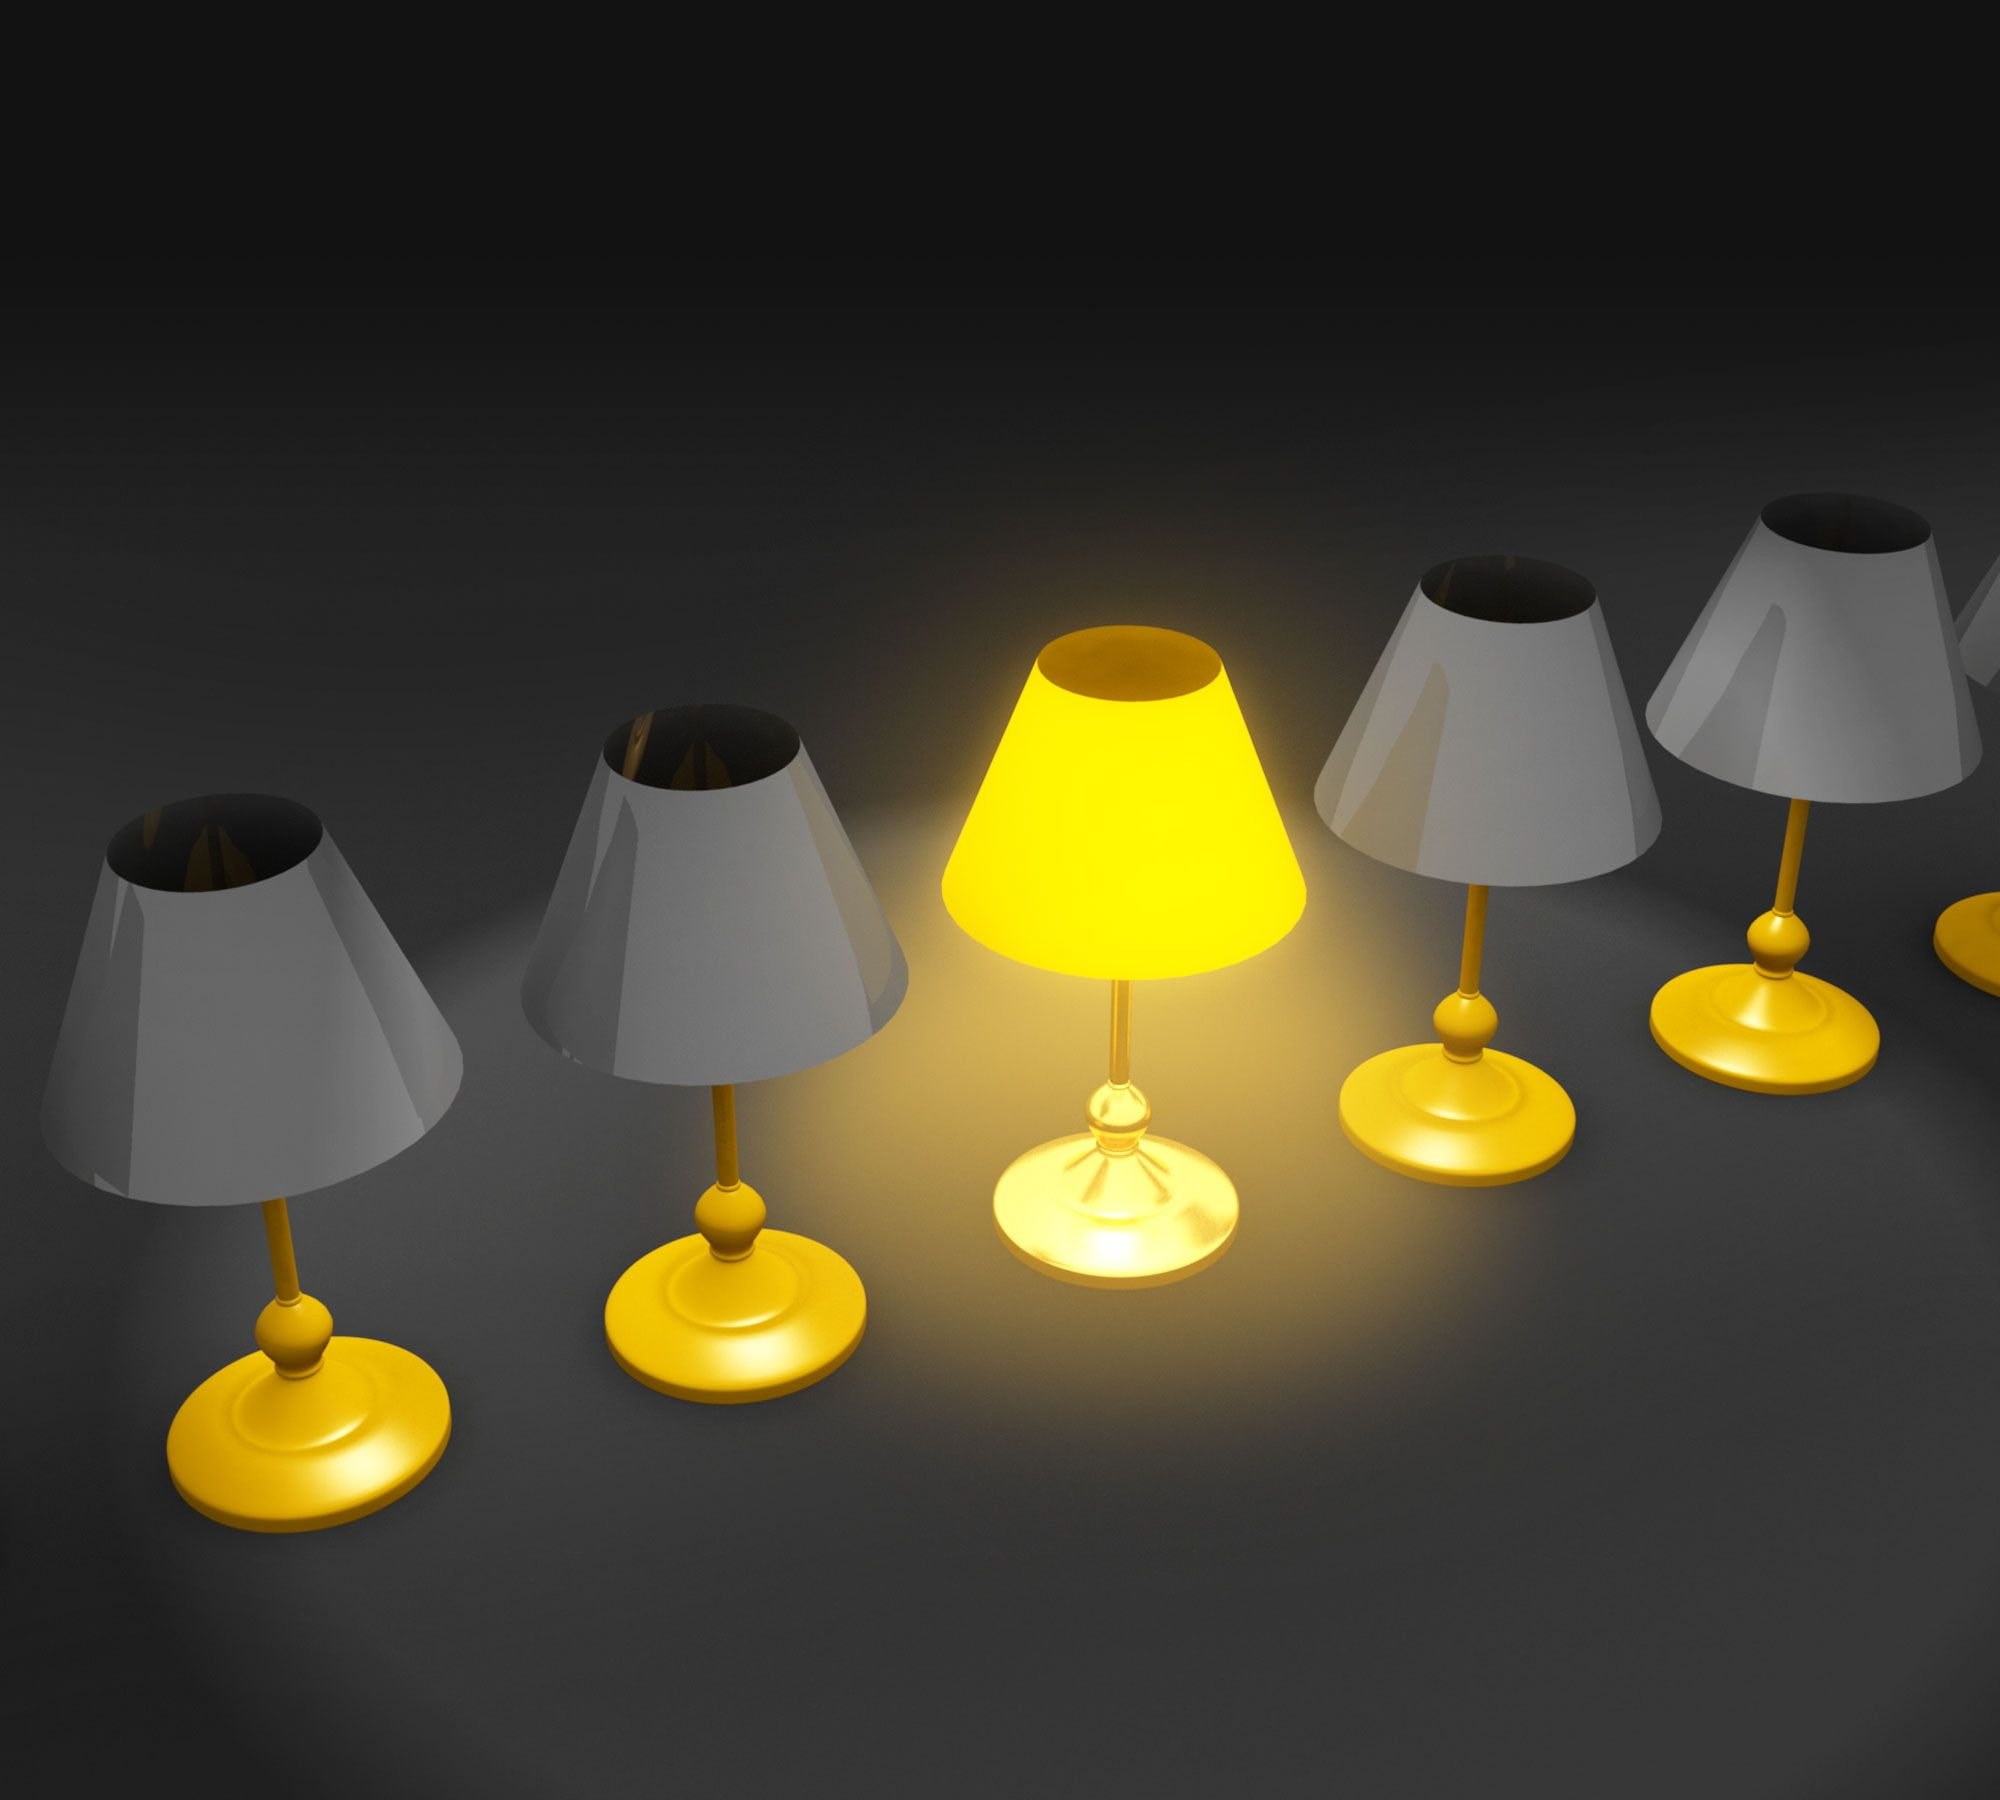 shiny golden lights stock - photo #36